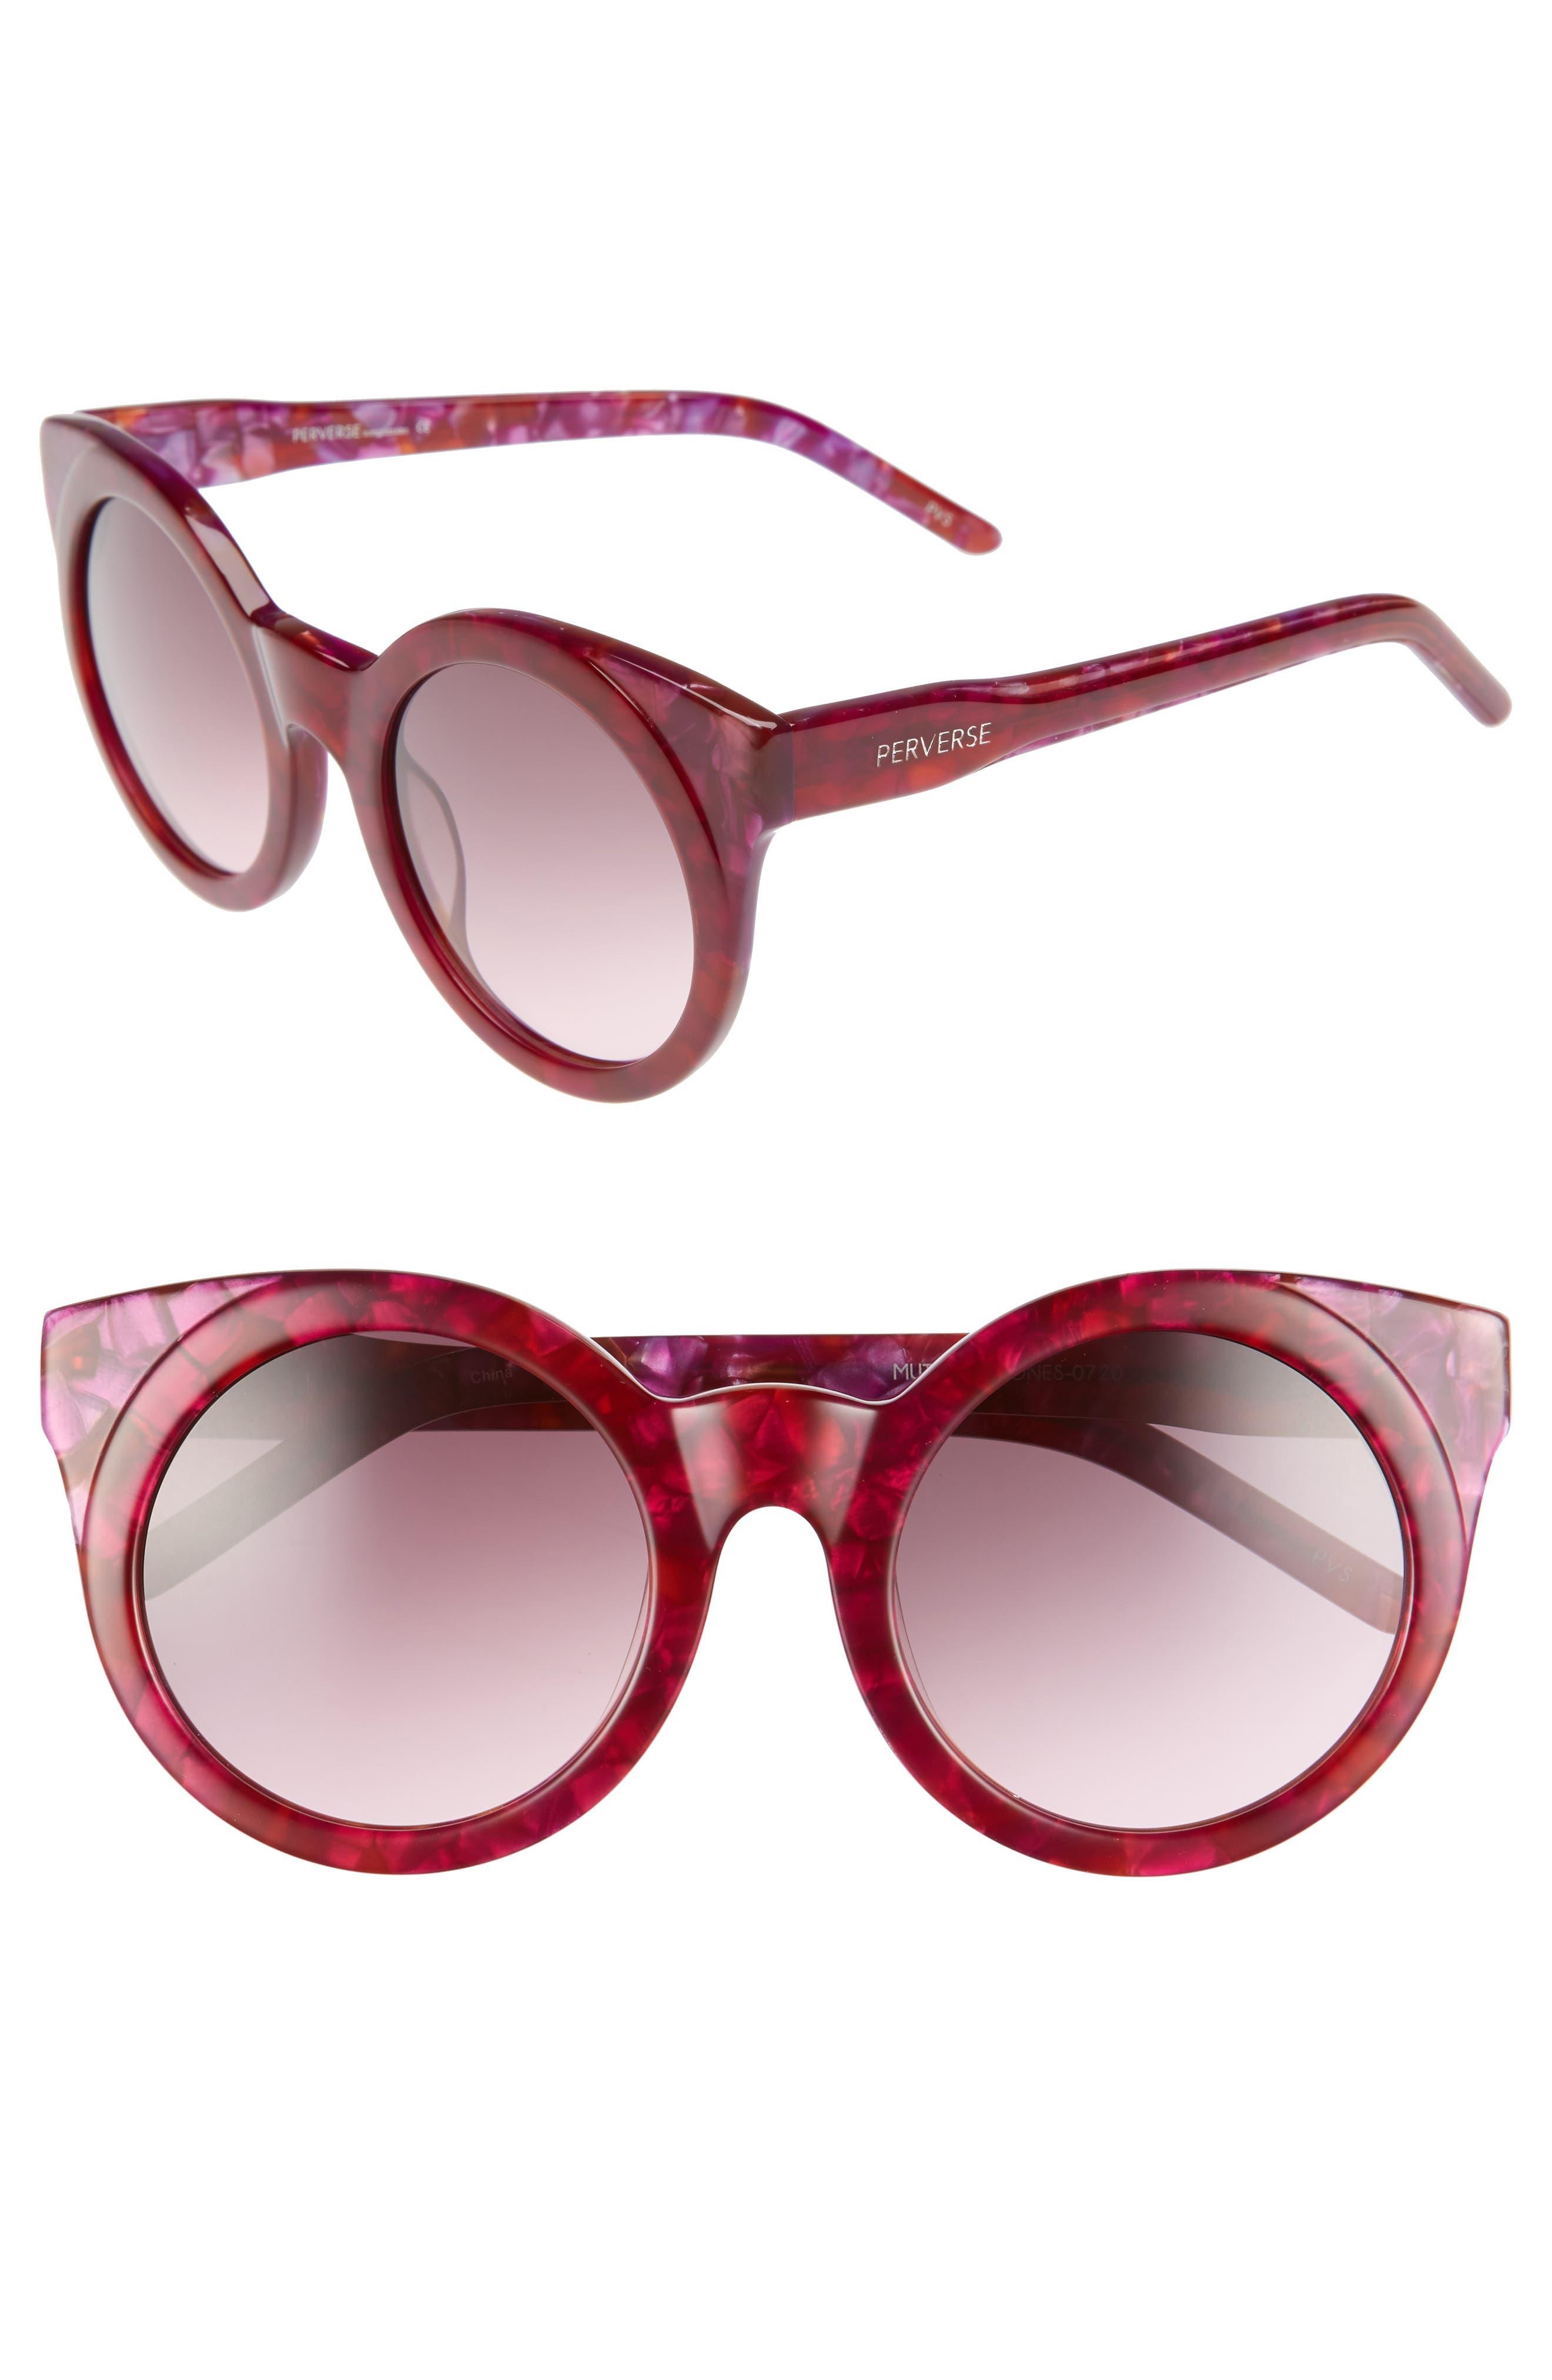 PERVERSE Mutiny 50mm Gradient Lens Cat Eye Sunglasses